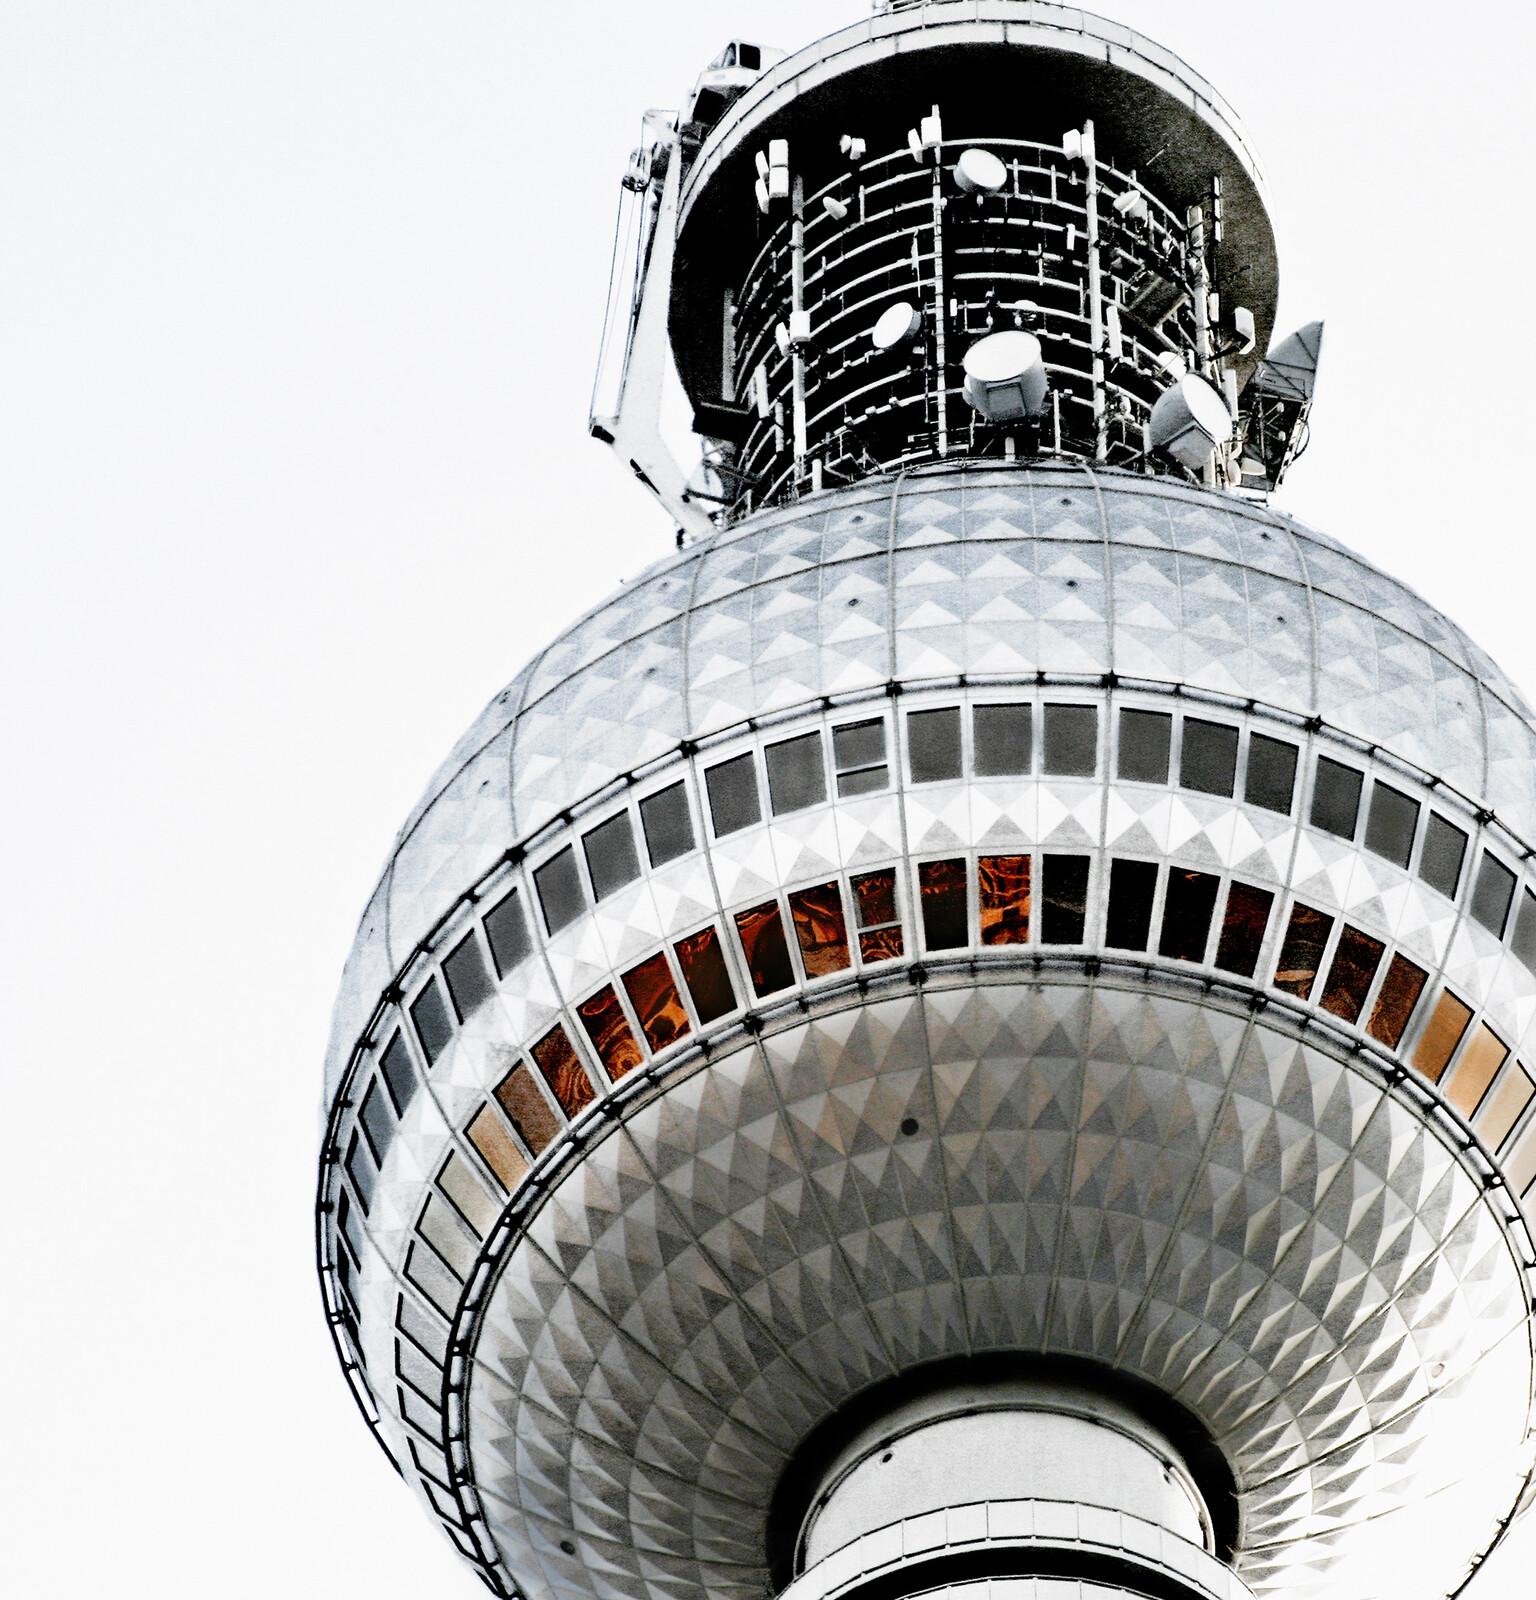 Fernsehturm - Cathrin Schulz